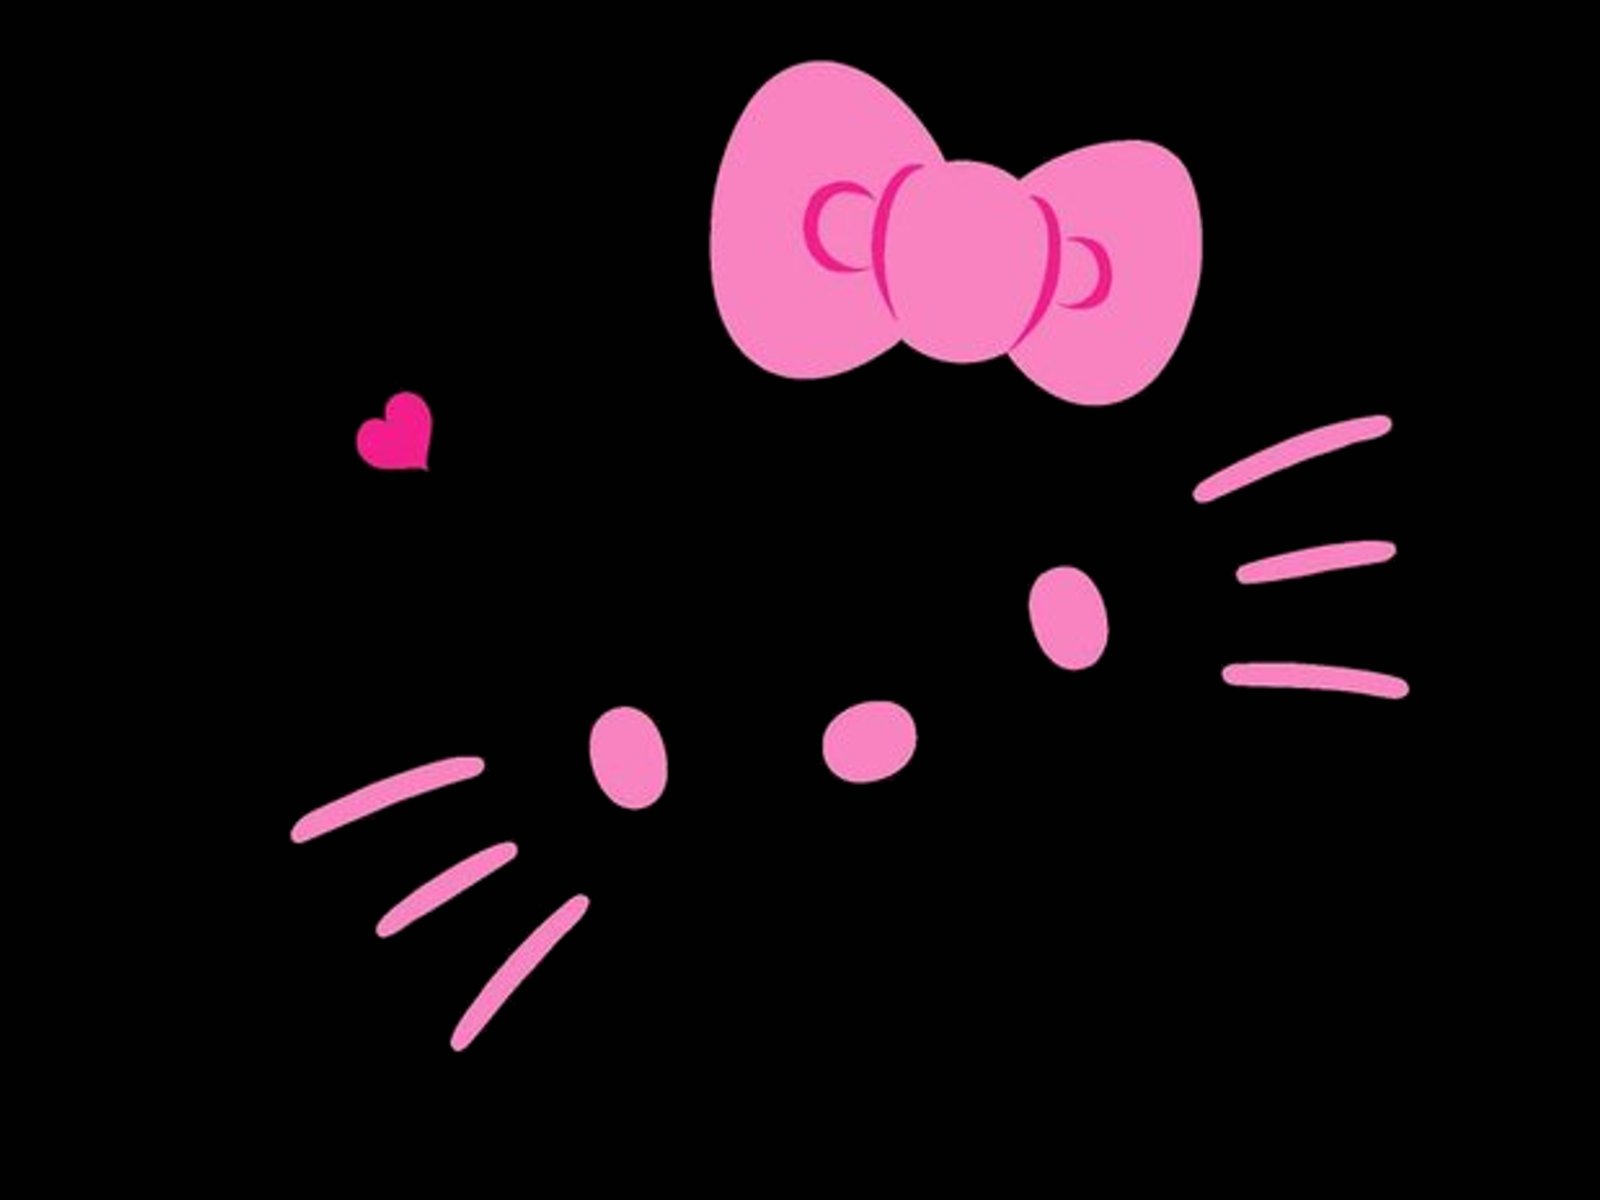 19 Hello Kitty WallpapersBest Wallpapers HD Backgrounds 1600x1200